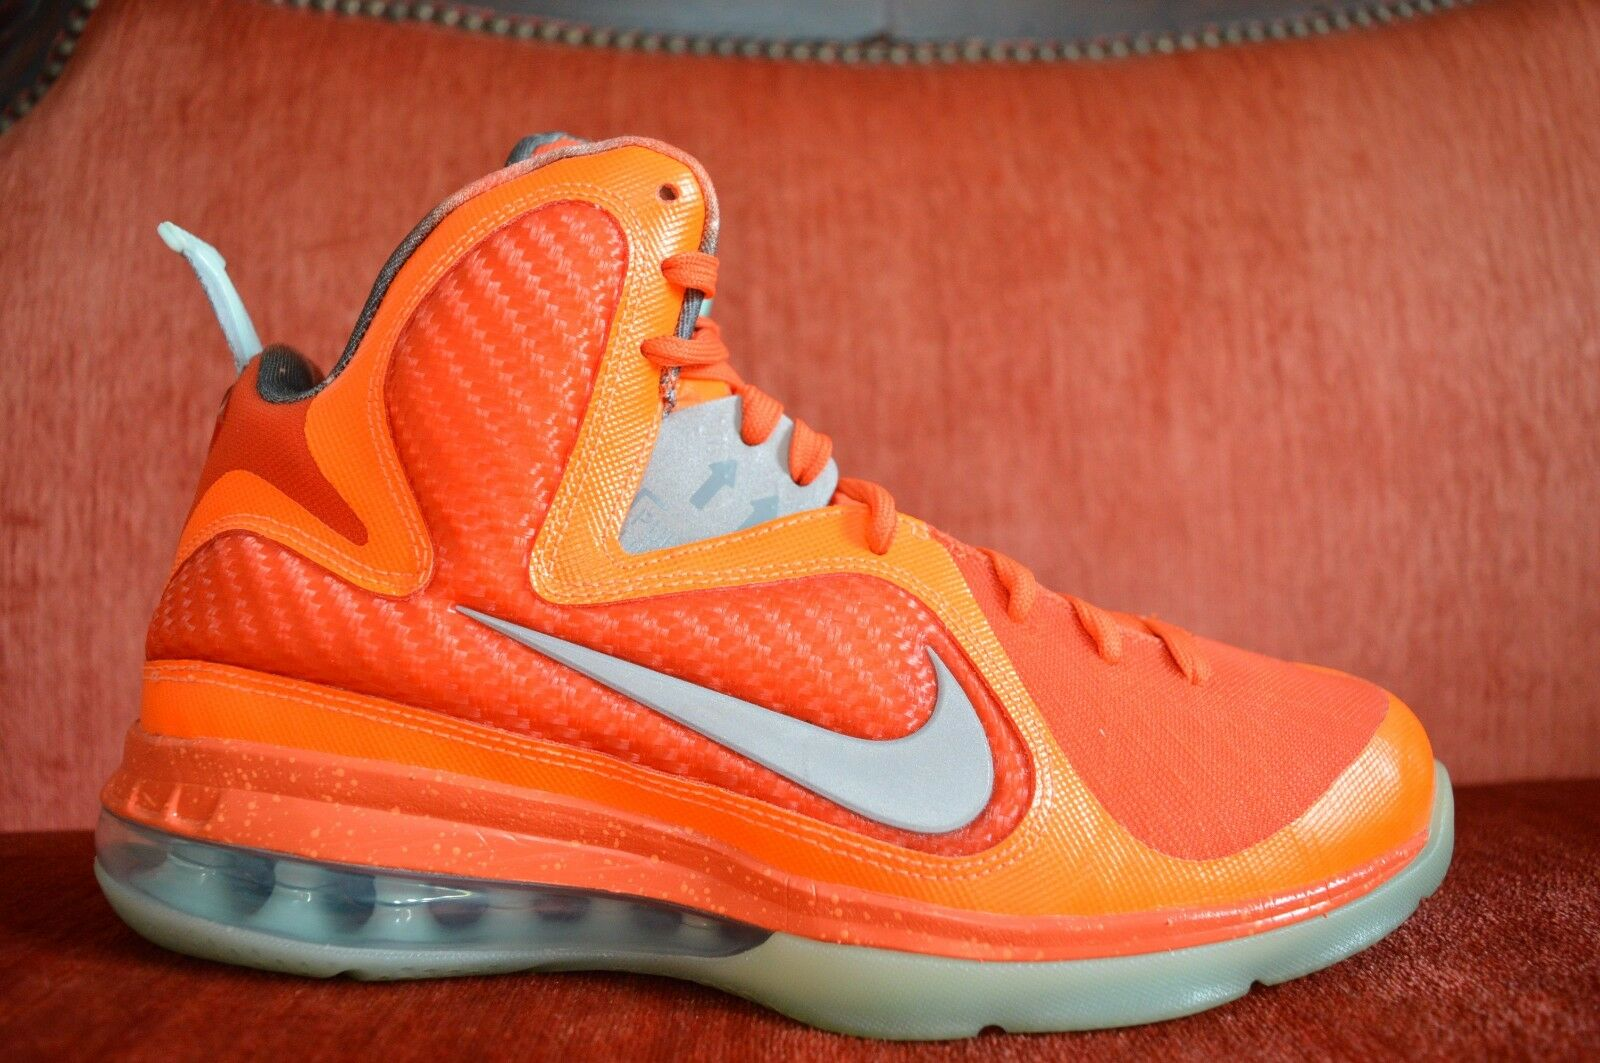 WORN TWICE Nike Lebron 9 Elite orange AS Galaxy Big Bangs 520811 800 Size 8.5